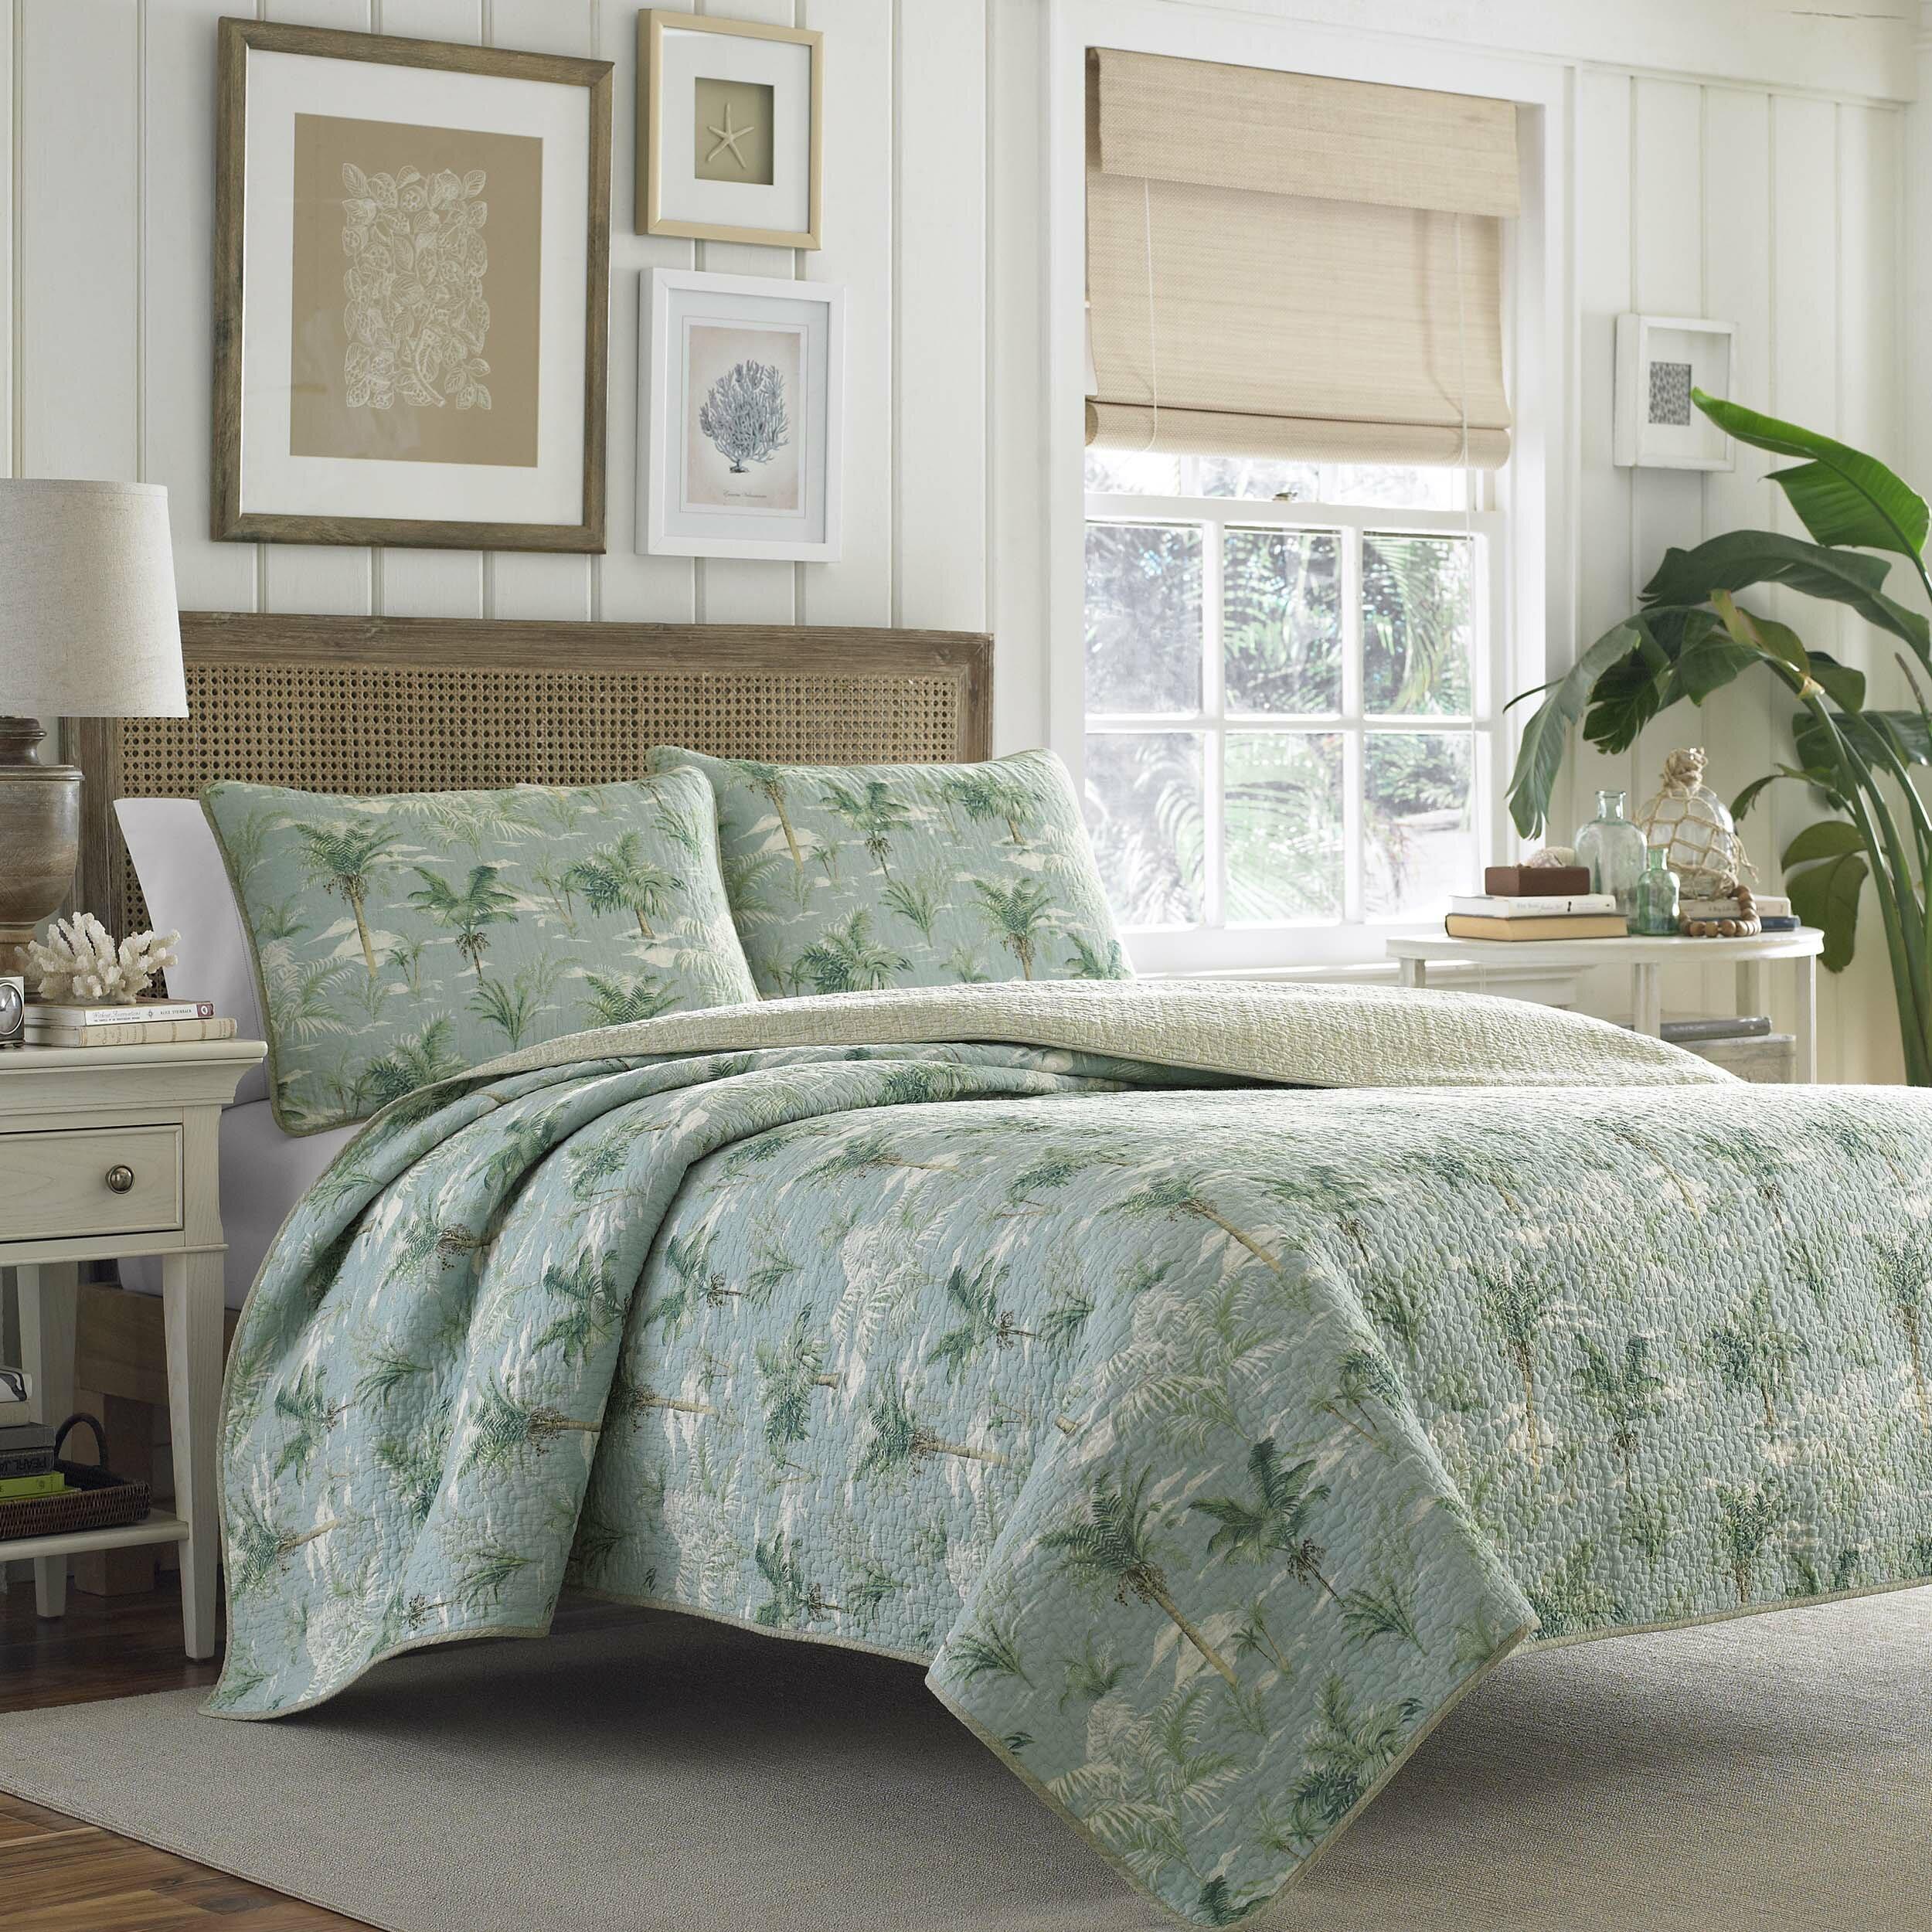 tommy bahama bedding anglers isle reversible quilt set reviews wayfair. Black Bedroom Furniture Sets. Home Design Ideas